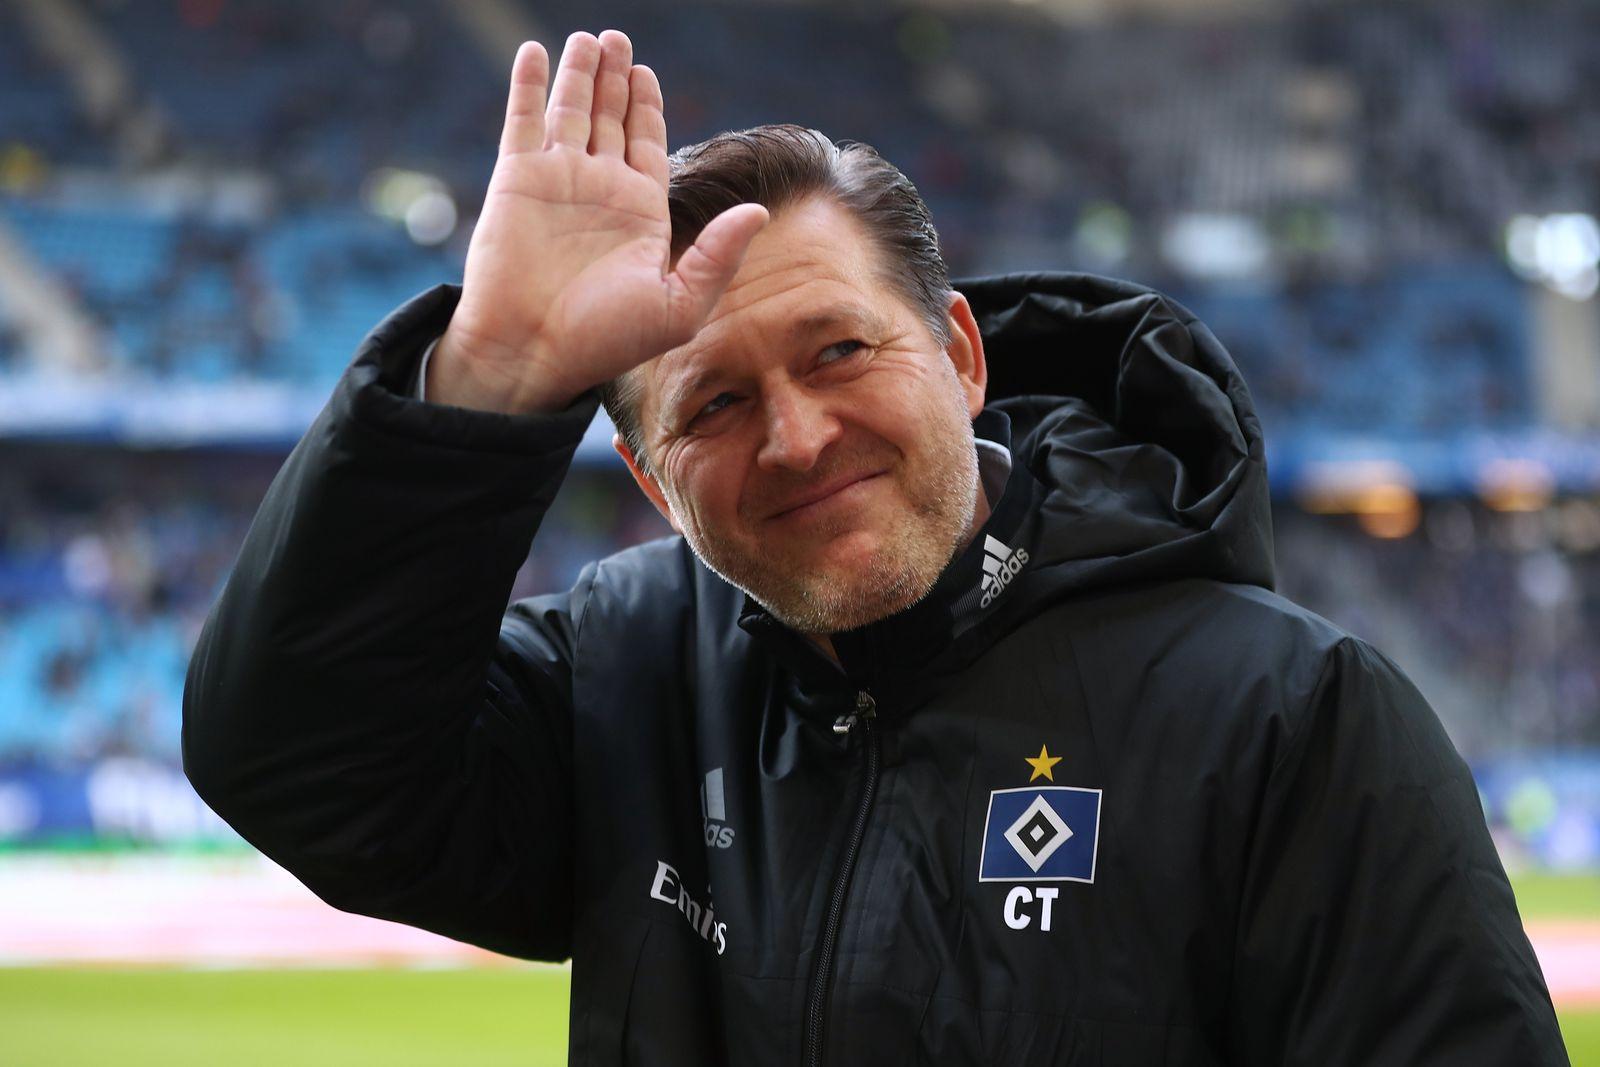 HSV Christian Titz